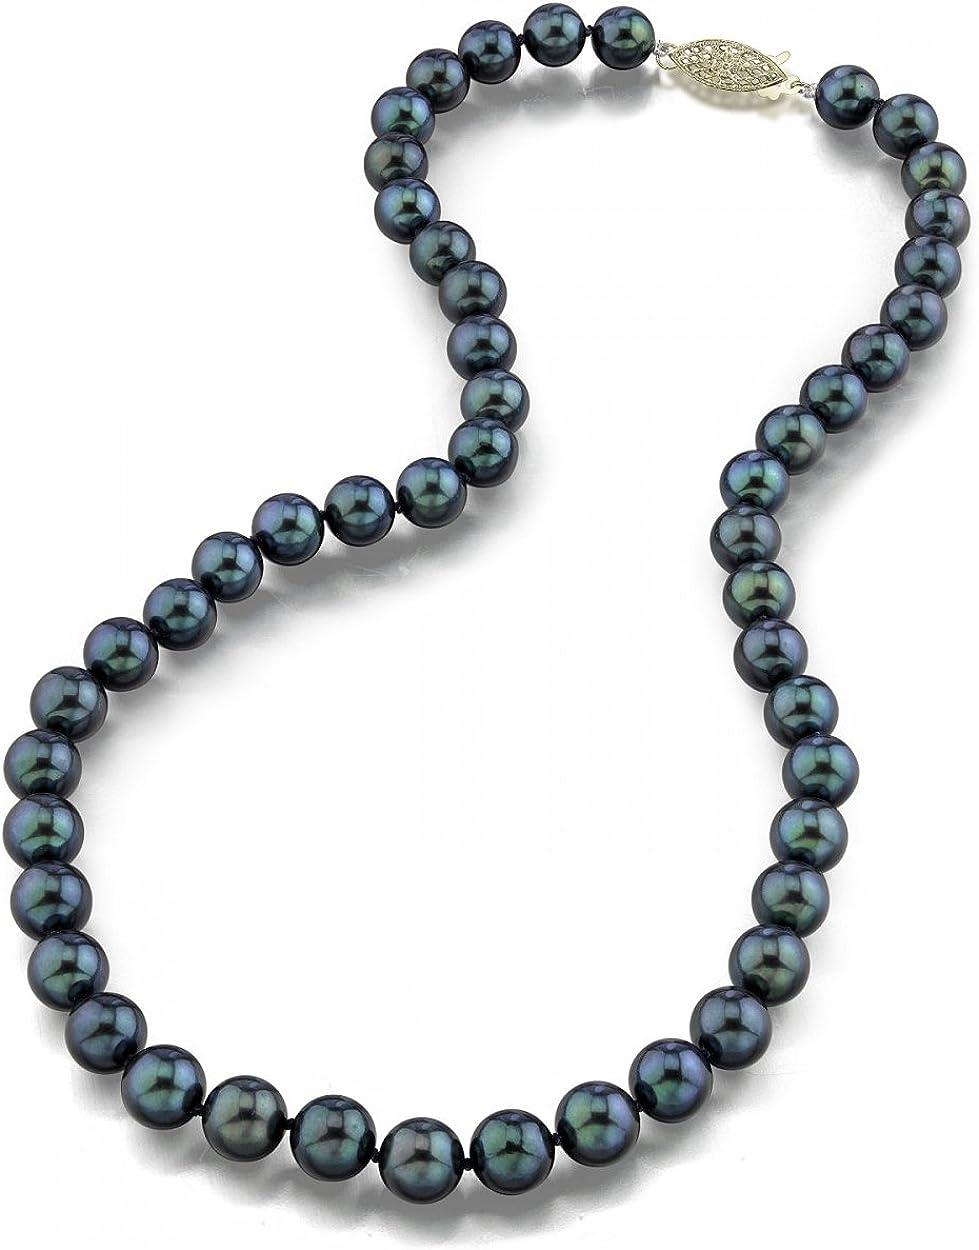 Negro japonés collar de perlas Akoya 7 - 7,5 mm AAA agua dulce perla longitud Princess 45 cm - real oro cierre